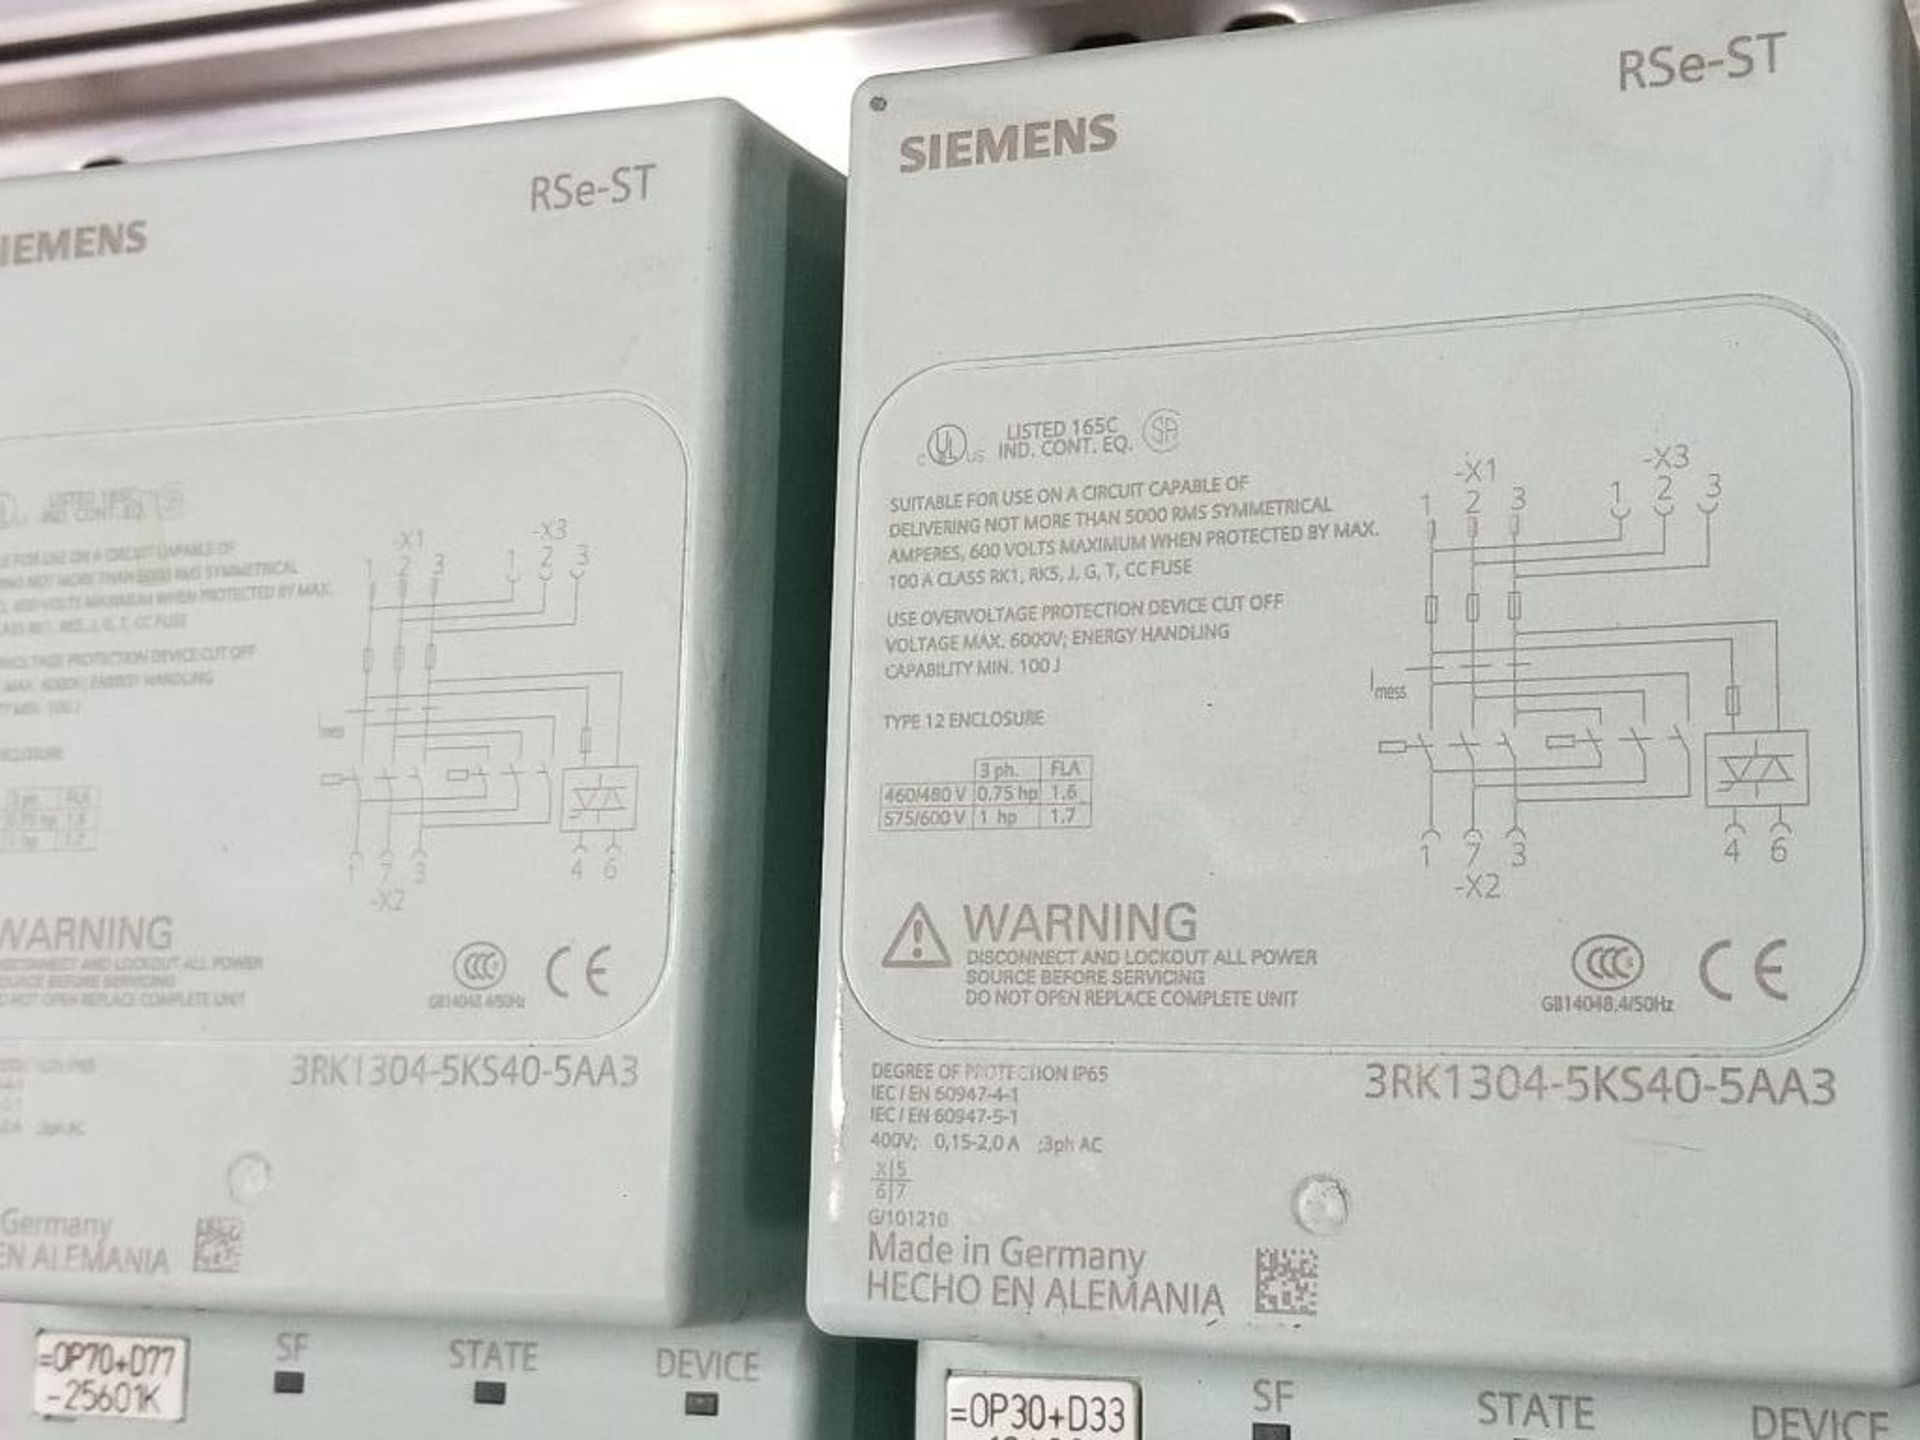 Siemens RSe-ST Reversing starter, DSe-ST Disconnect module flow control line. - Image 5 of 9